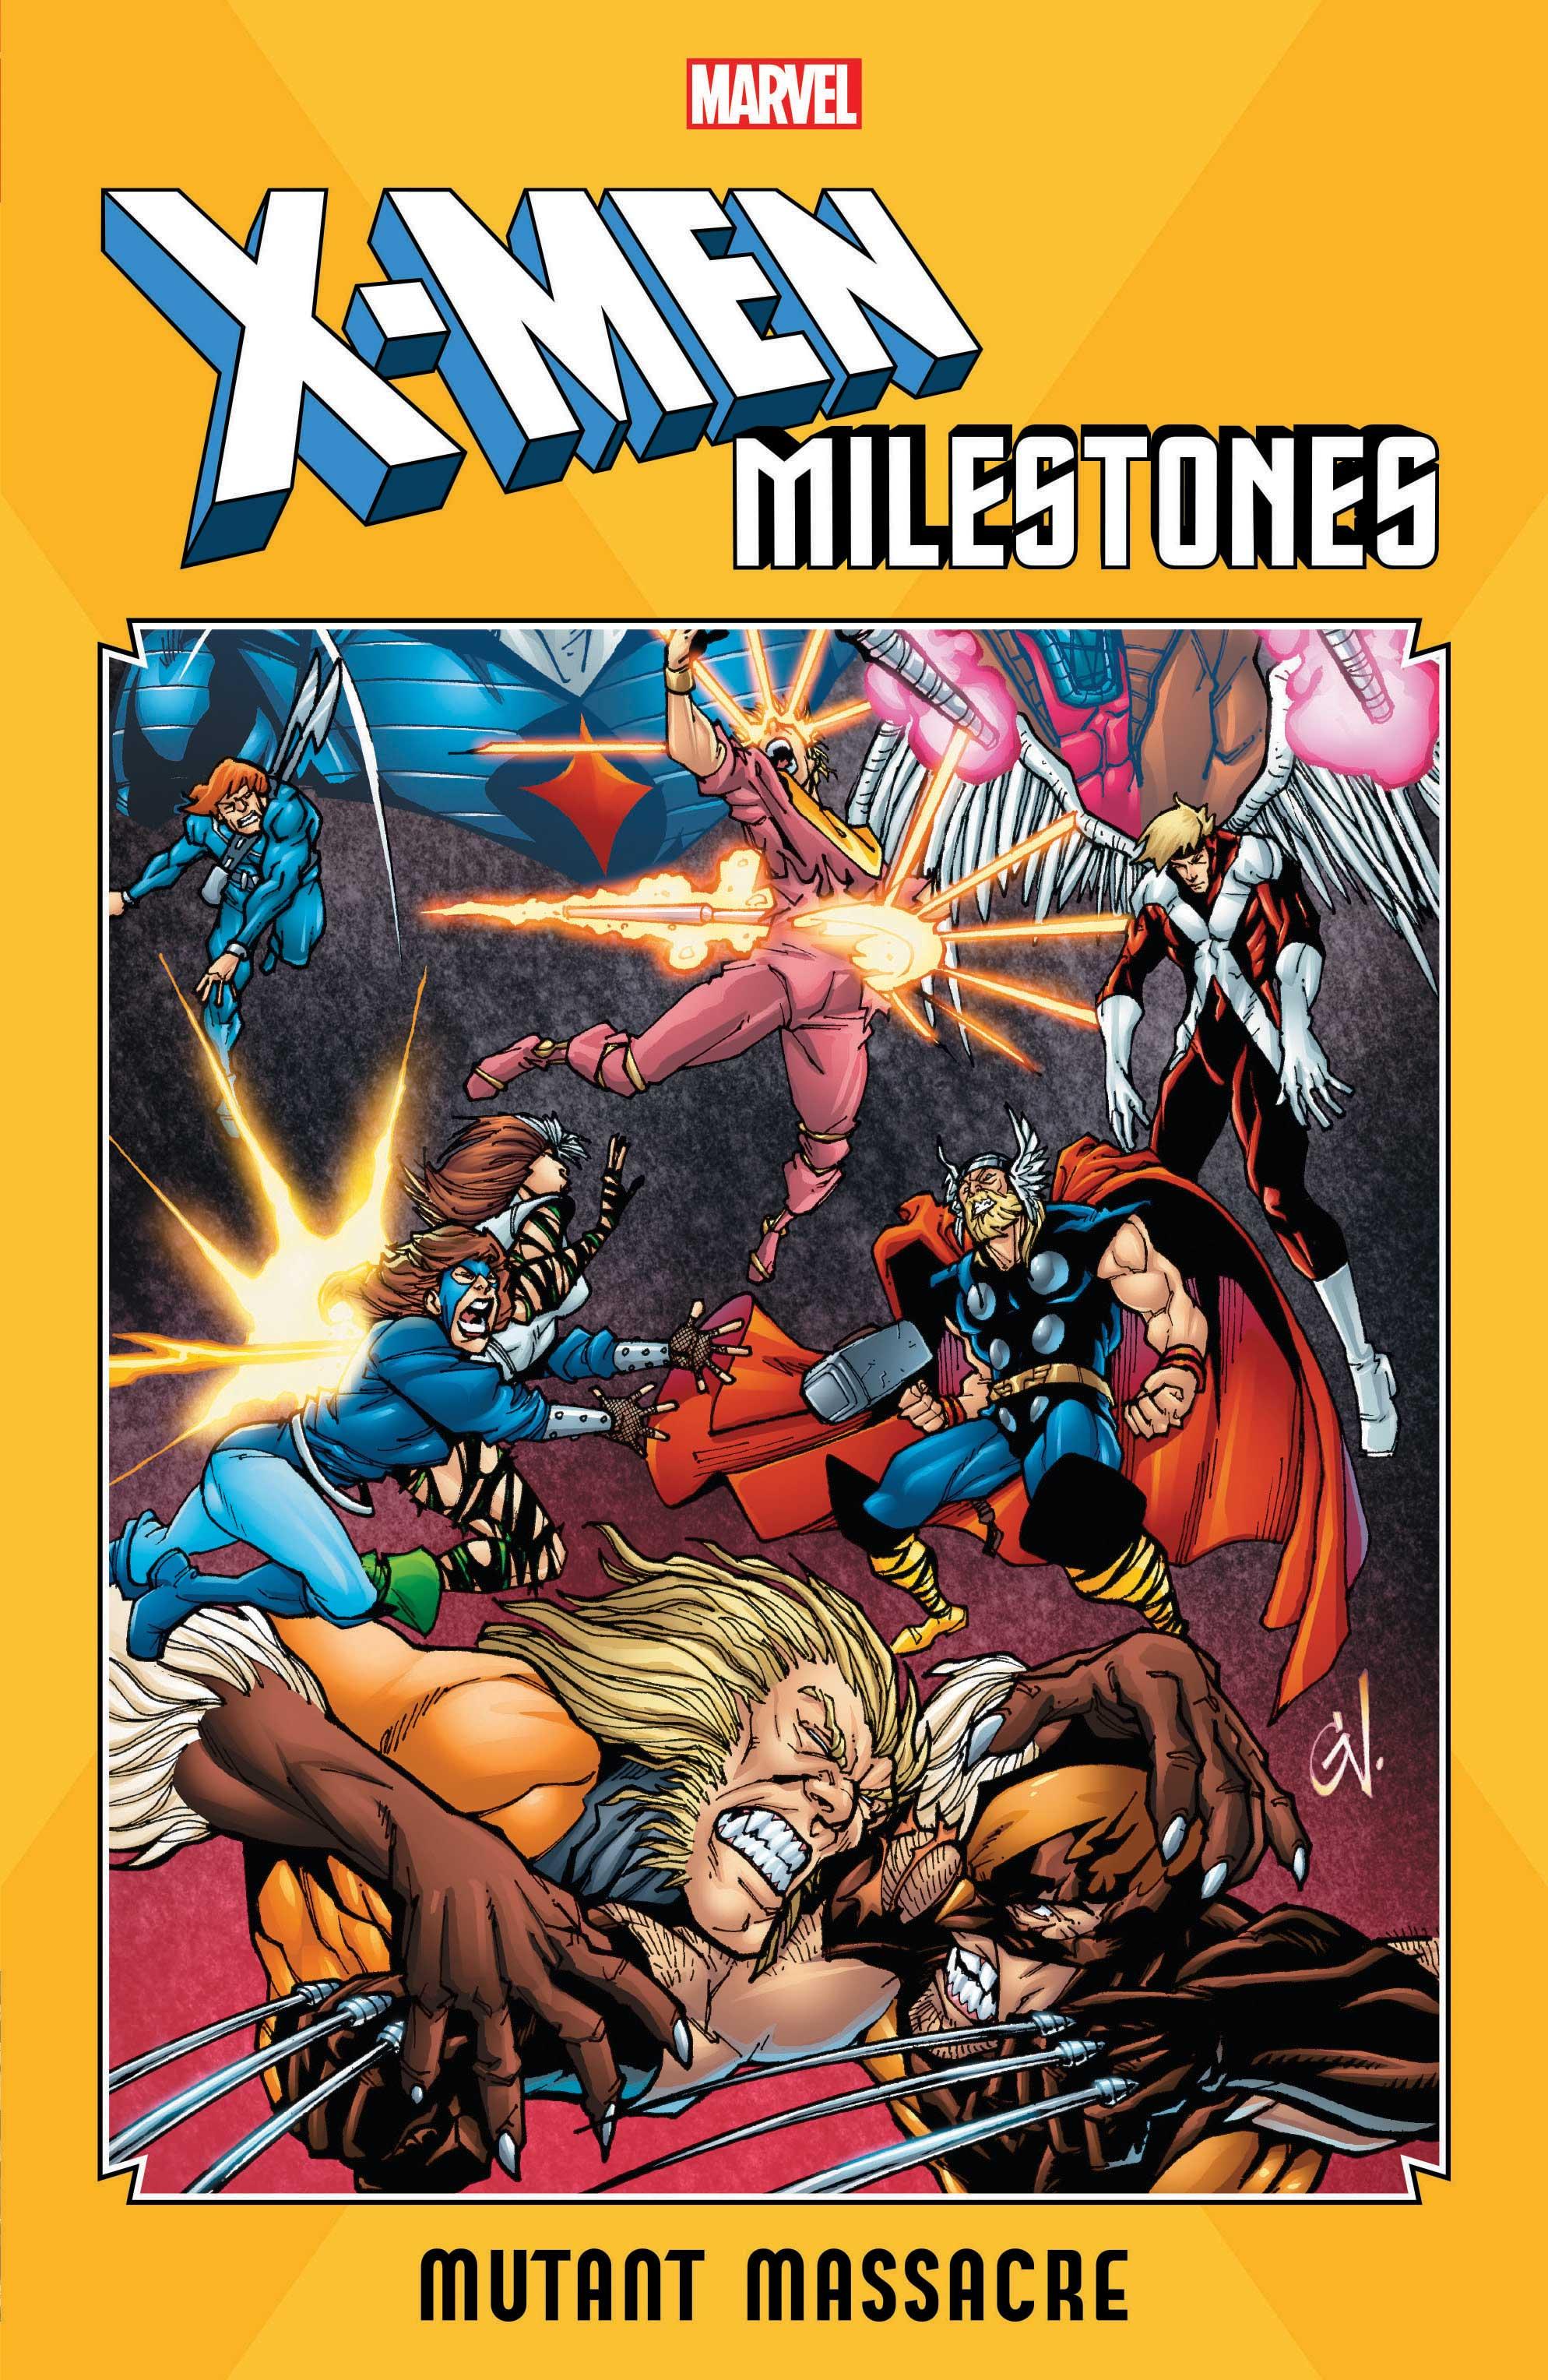 Marvel to Release X-Men Milestones TP - The PullBox